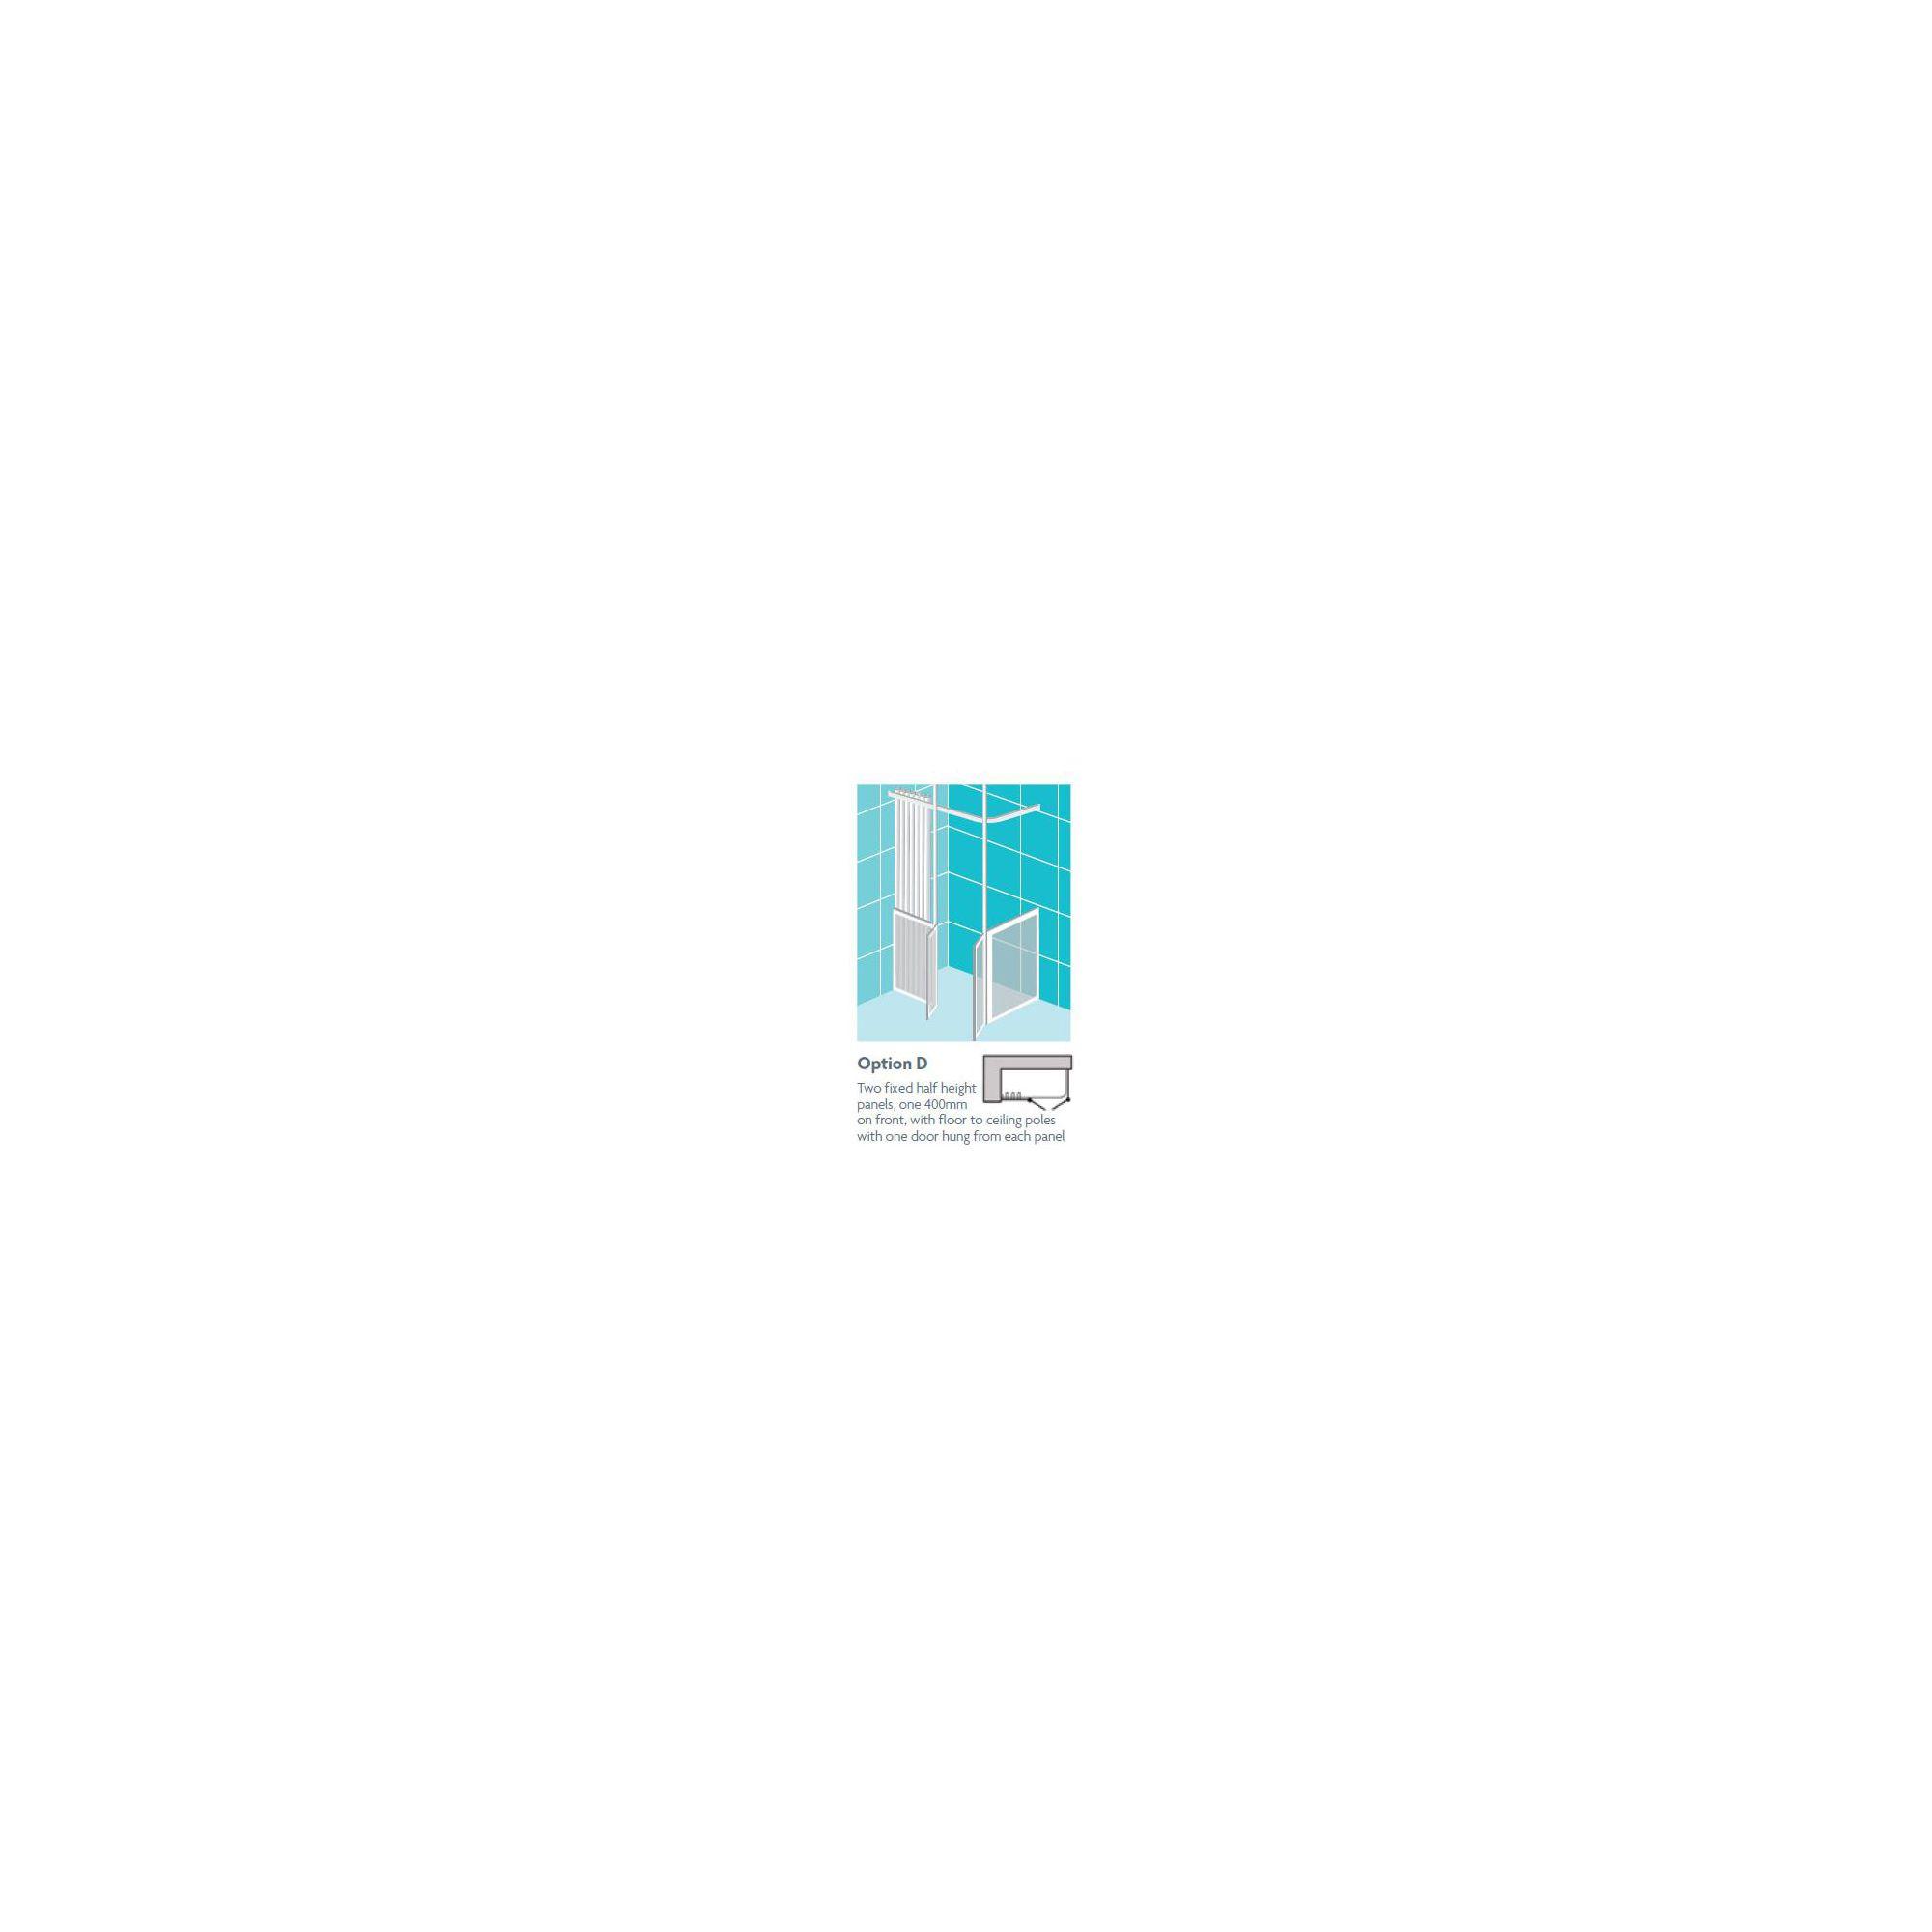 Impey Supreme Corner Door Option D Left Hand 1400mm x 900mm at Tescos Direct